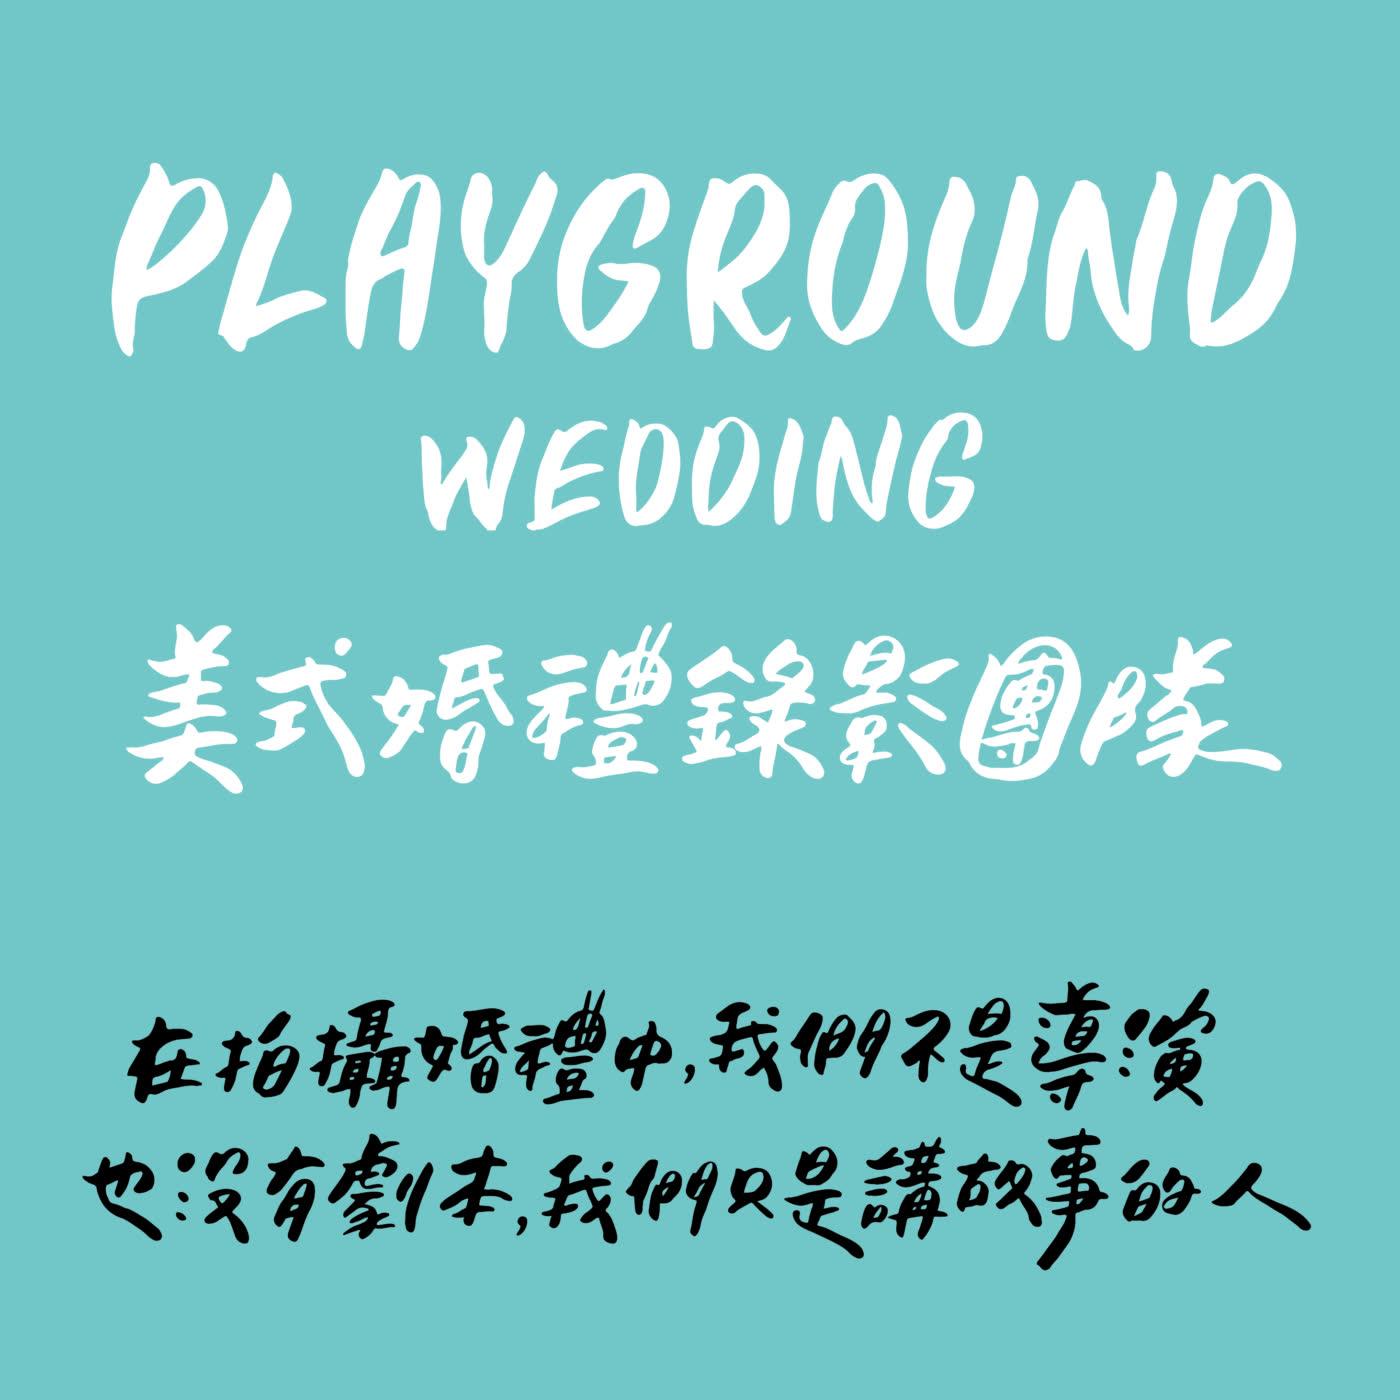 Playground wedding 你所不知道的婚禮大小事